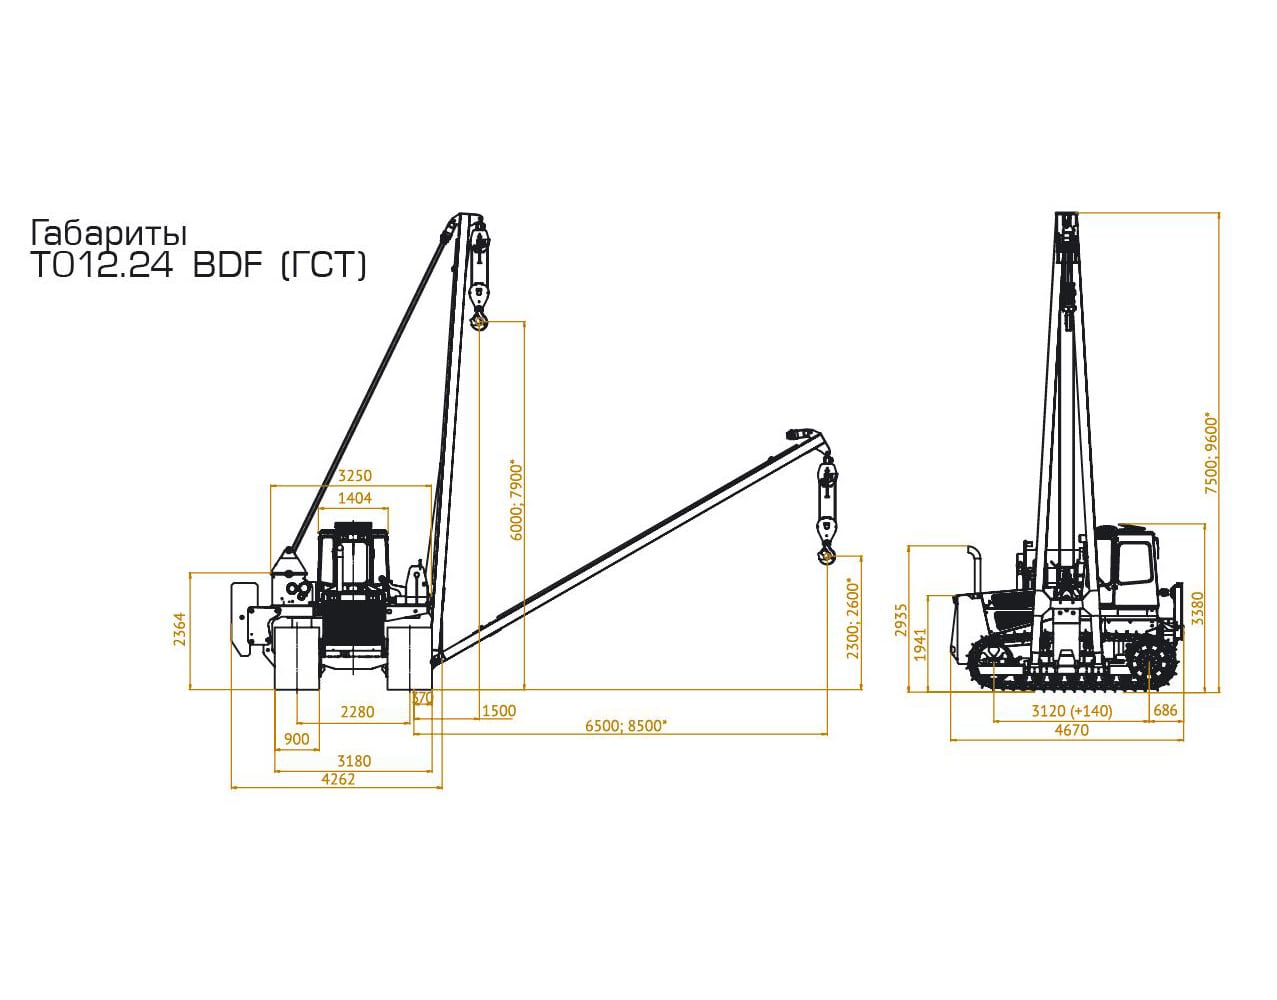 Габаритная схема Трубоукладчик ТО-1224